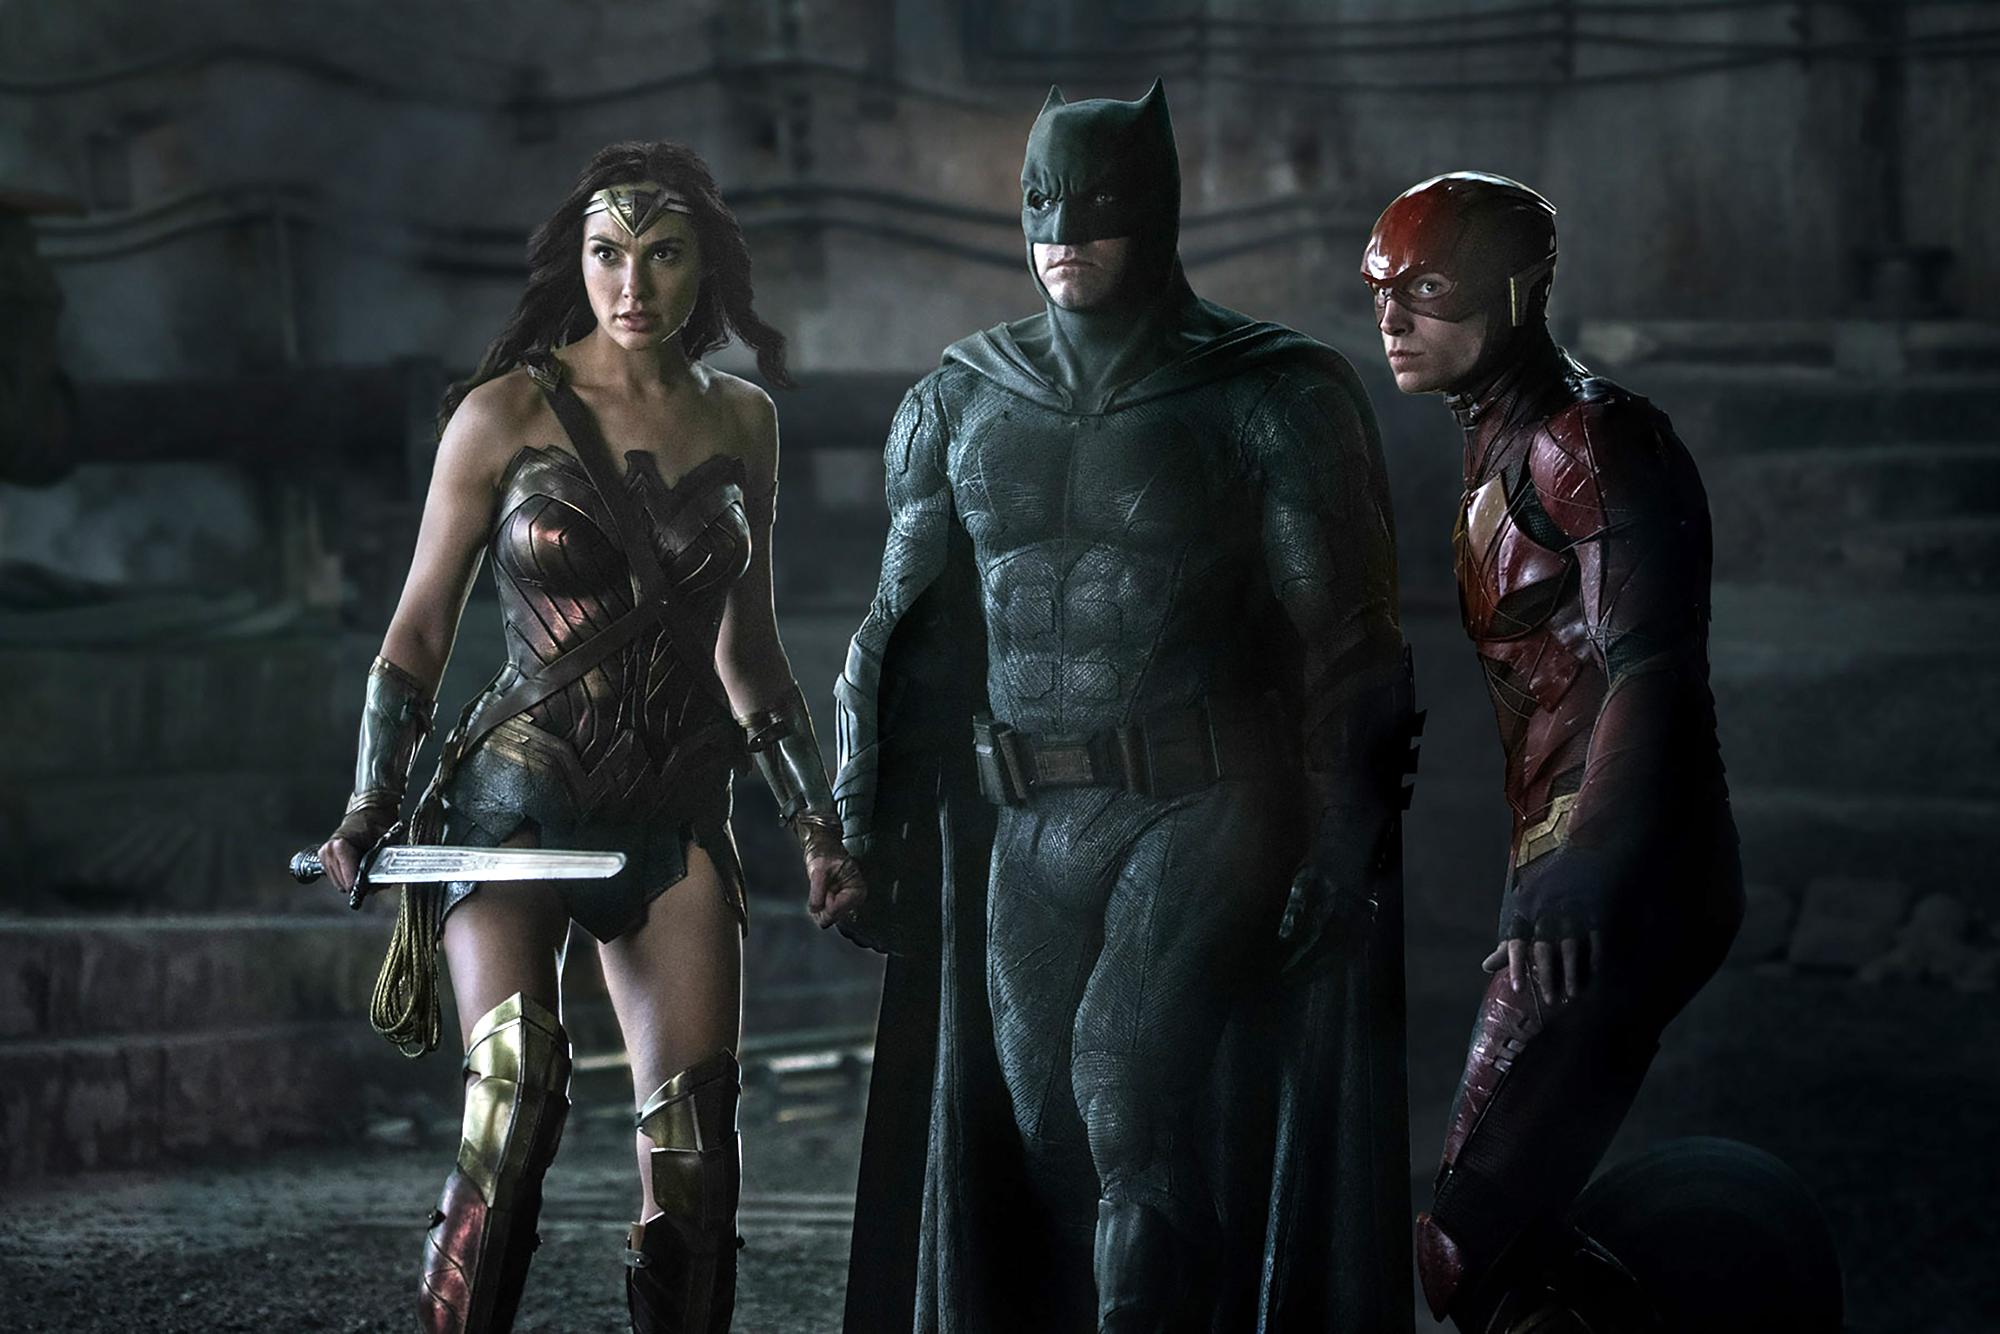 New 'Justice League' image teams up Batman, Wonder Woman